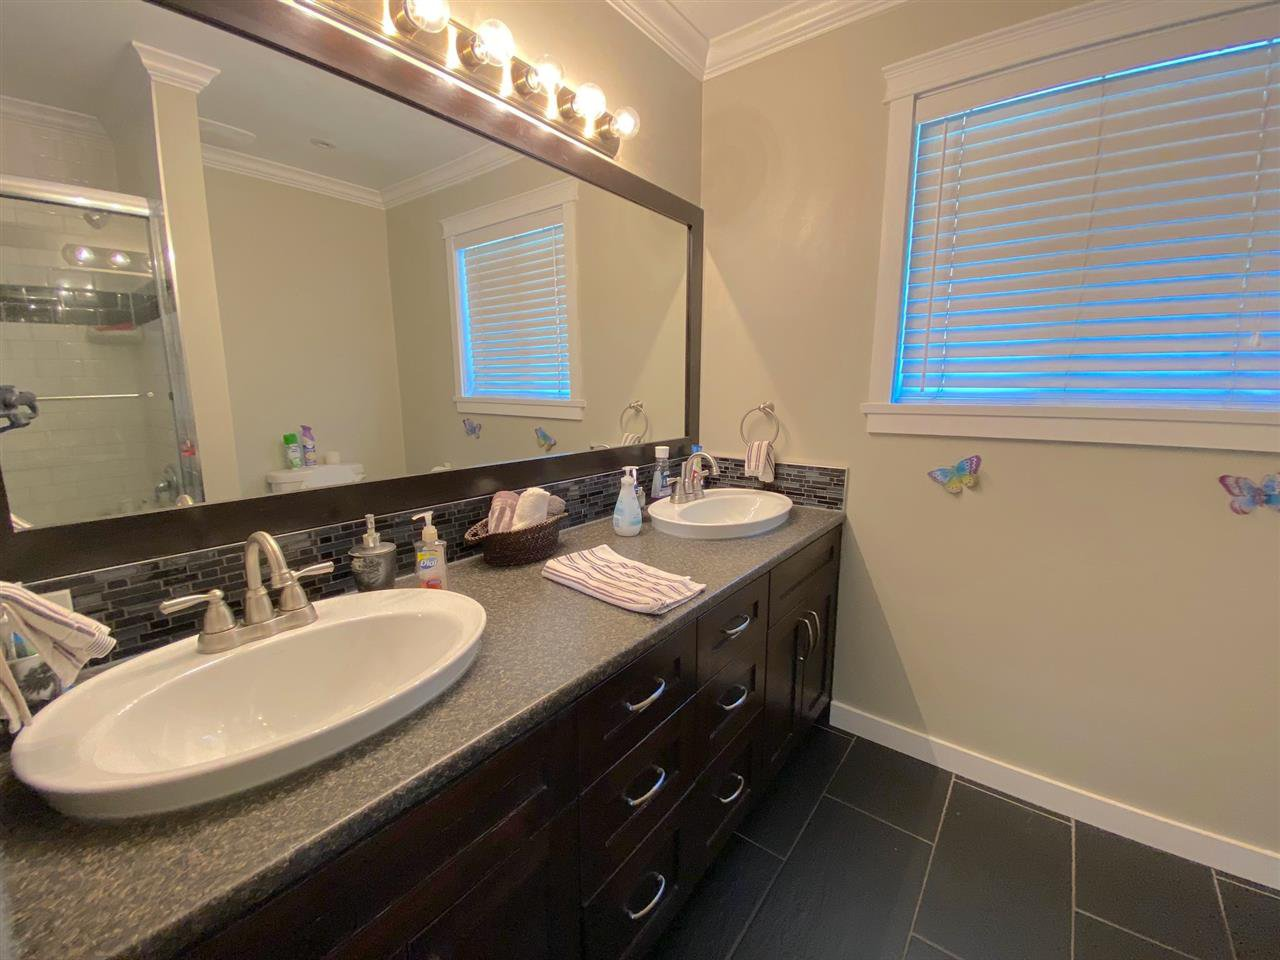 Photo 8: Photos: 555 55A STREET in Delta: Pebble Hill House for sale (Tsawwassen)  : MLS®# R2481635